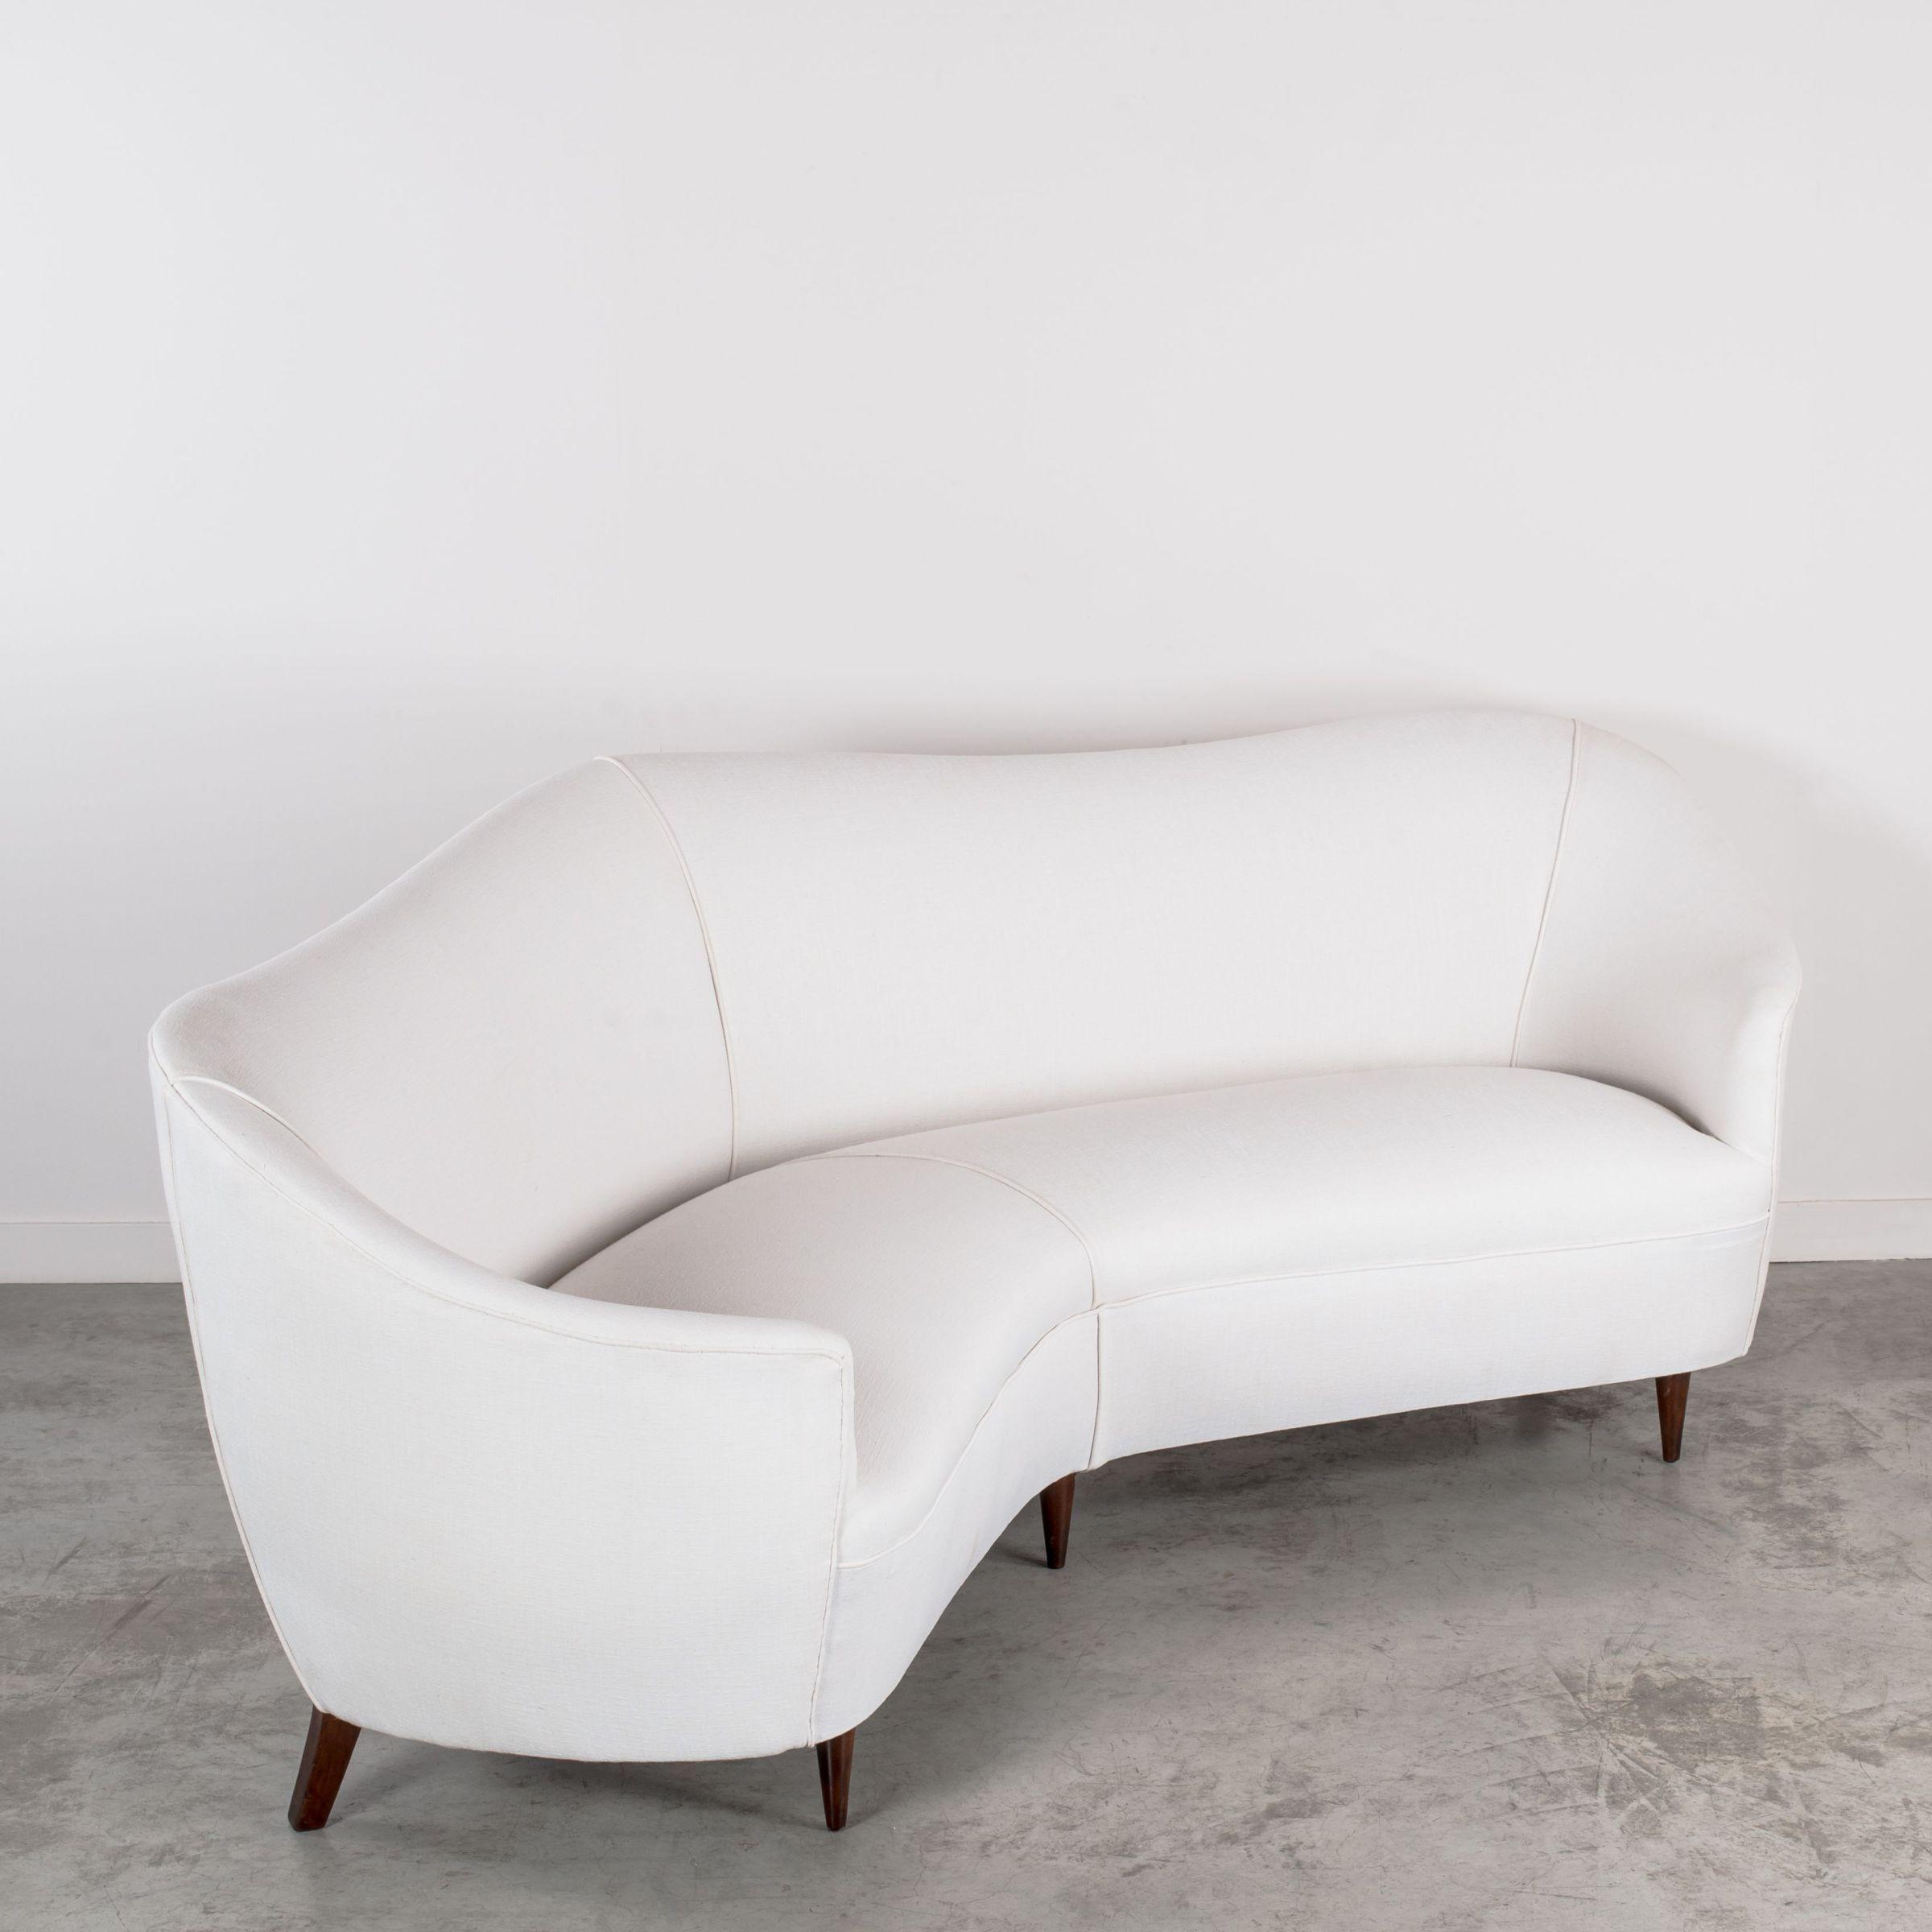 Gio Ponti; Sofa, 1938. #productdesign #industrialdesign # ...